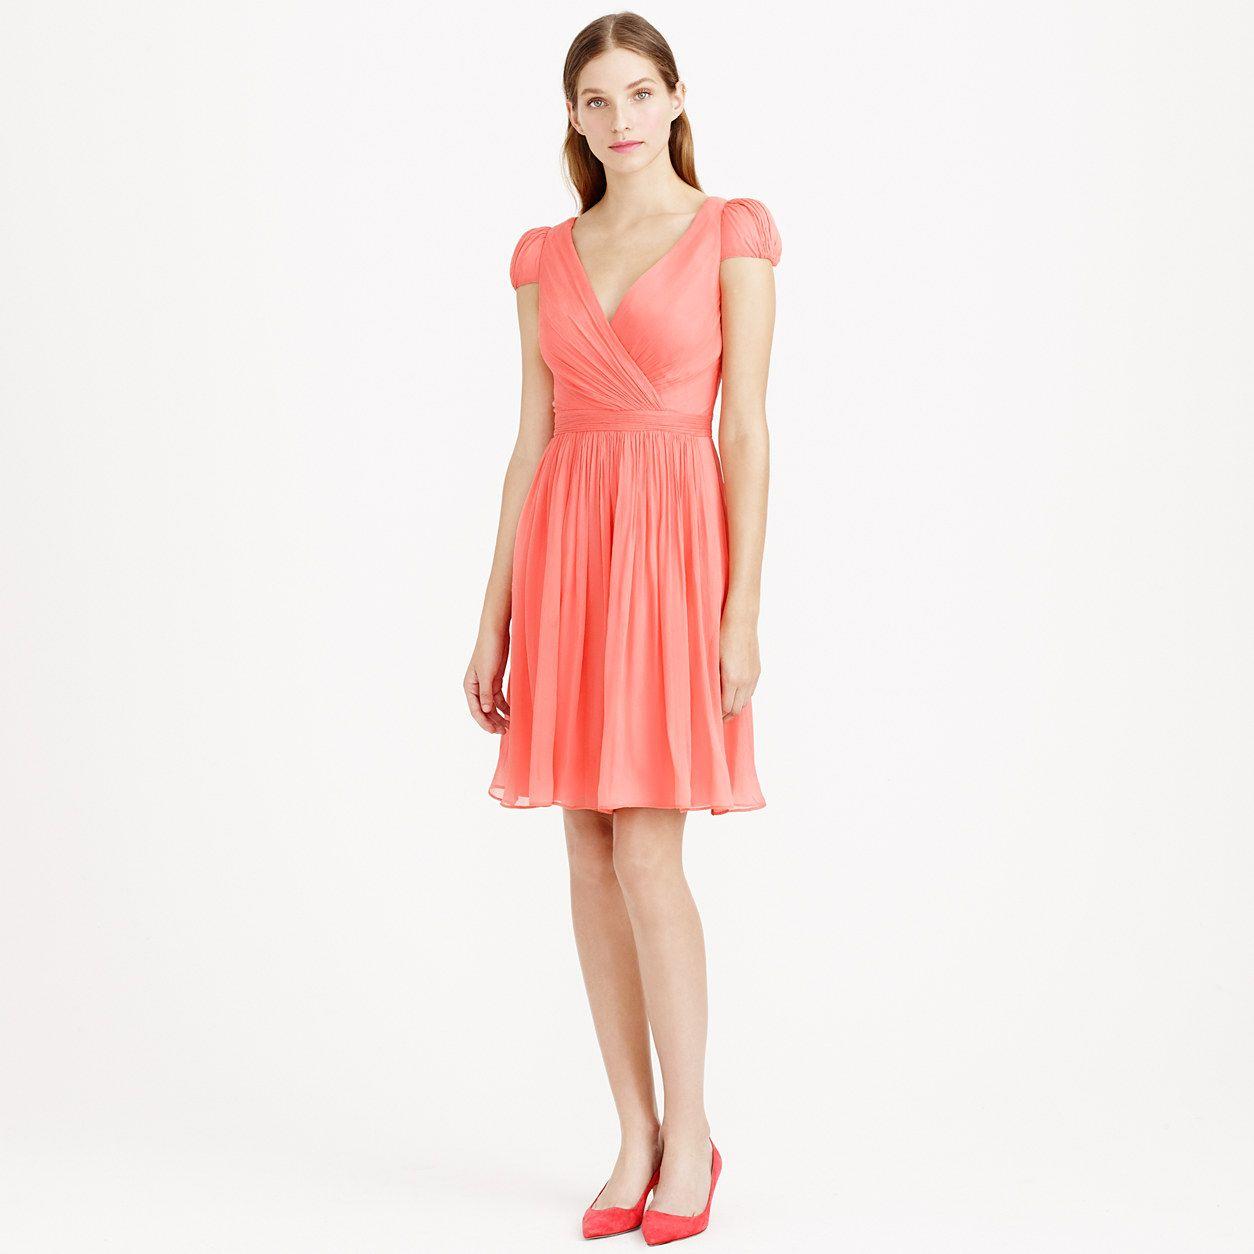 Mirabelle dress in silk chiffon : silk chiffon | J.Crew this dress ...